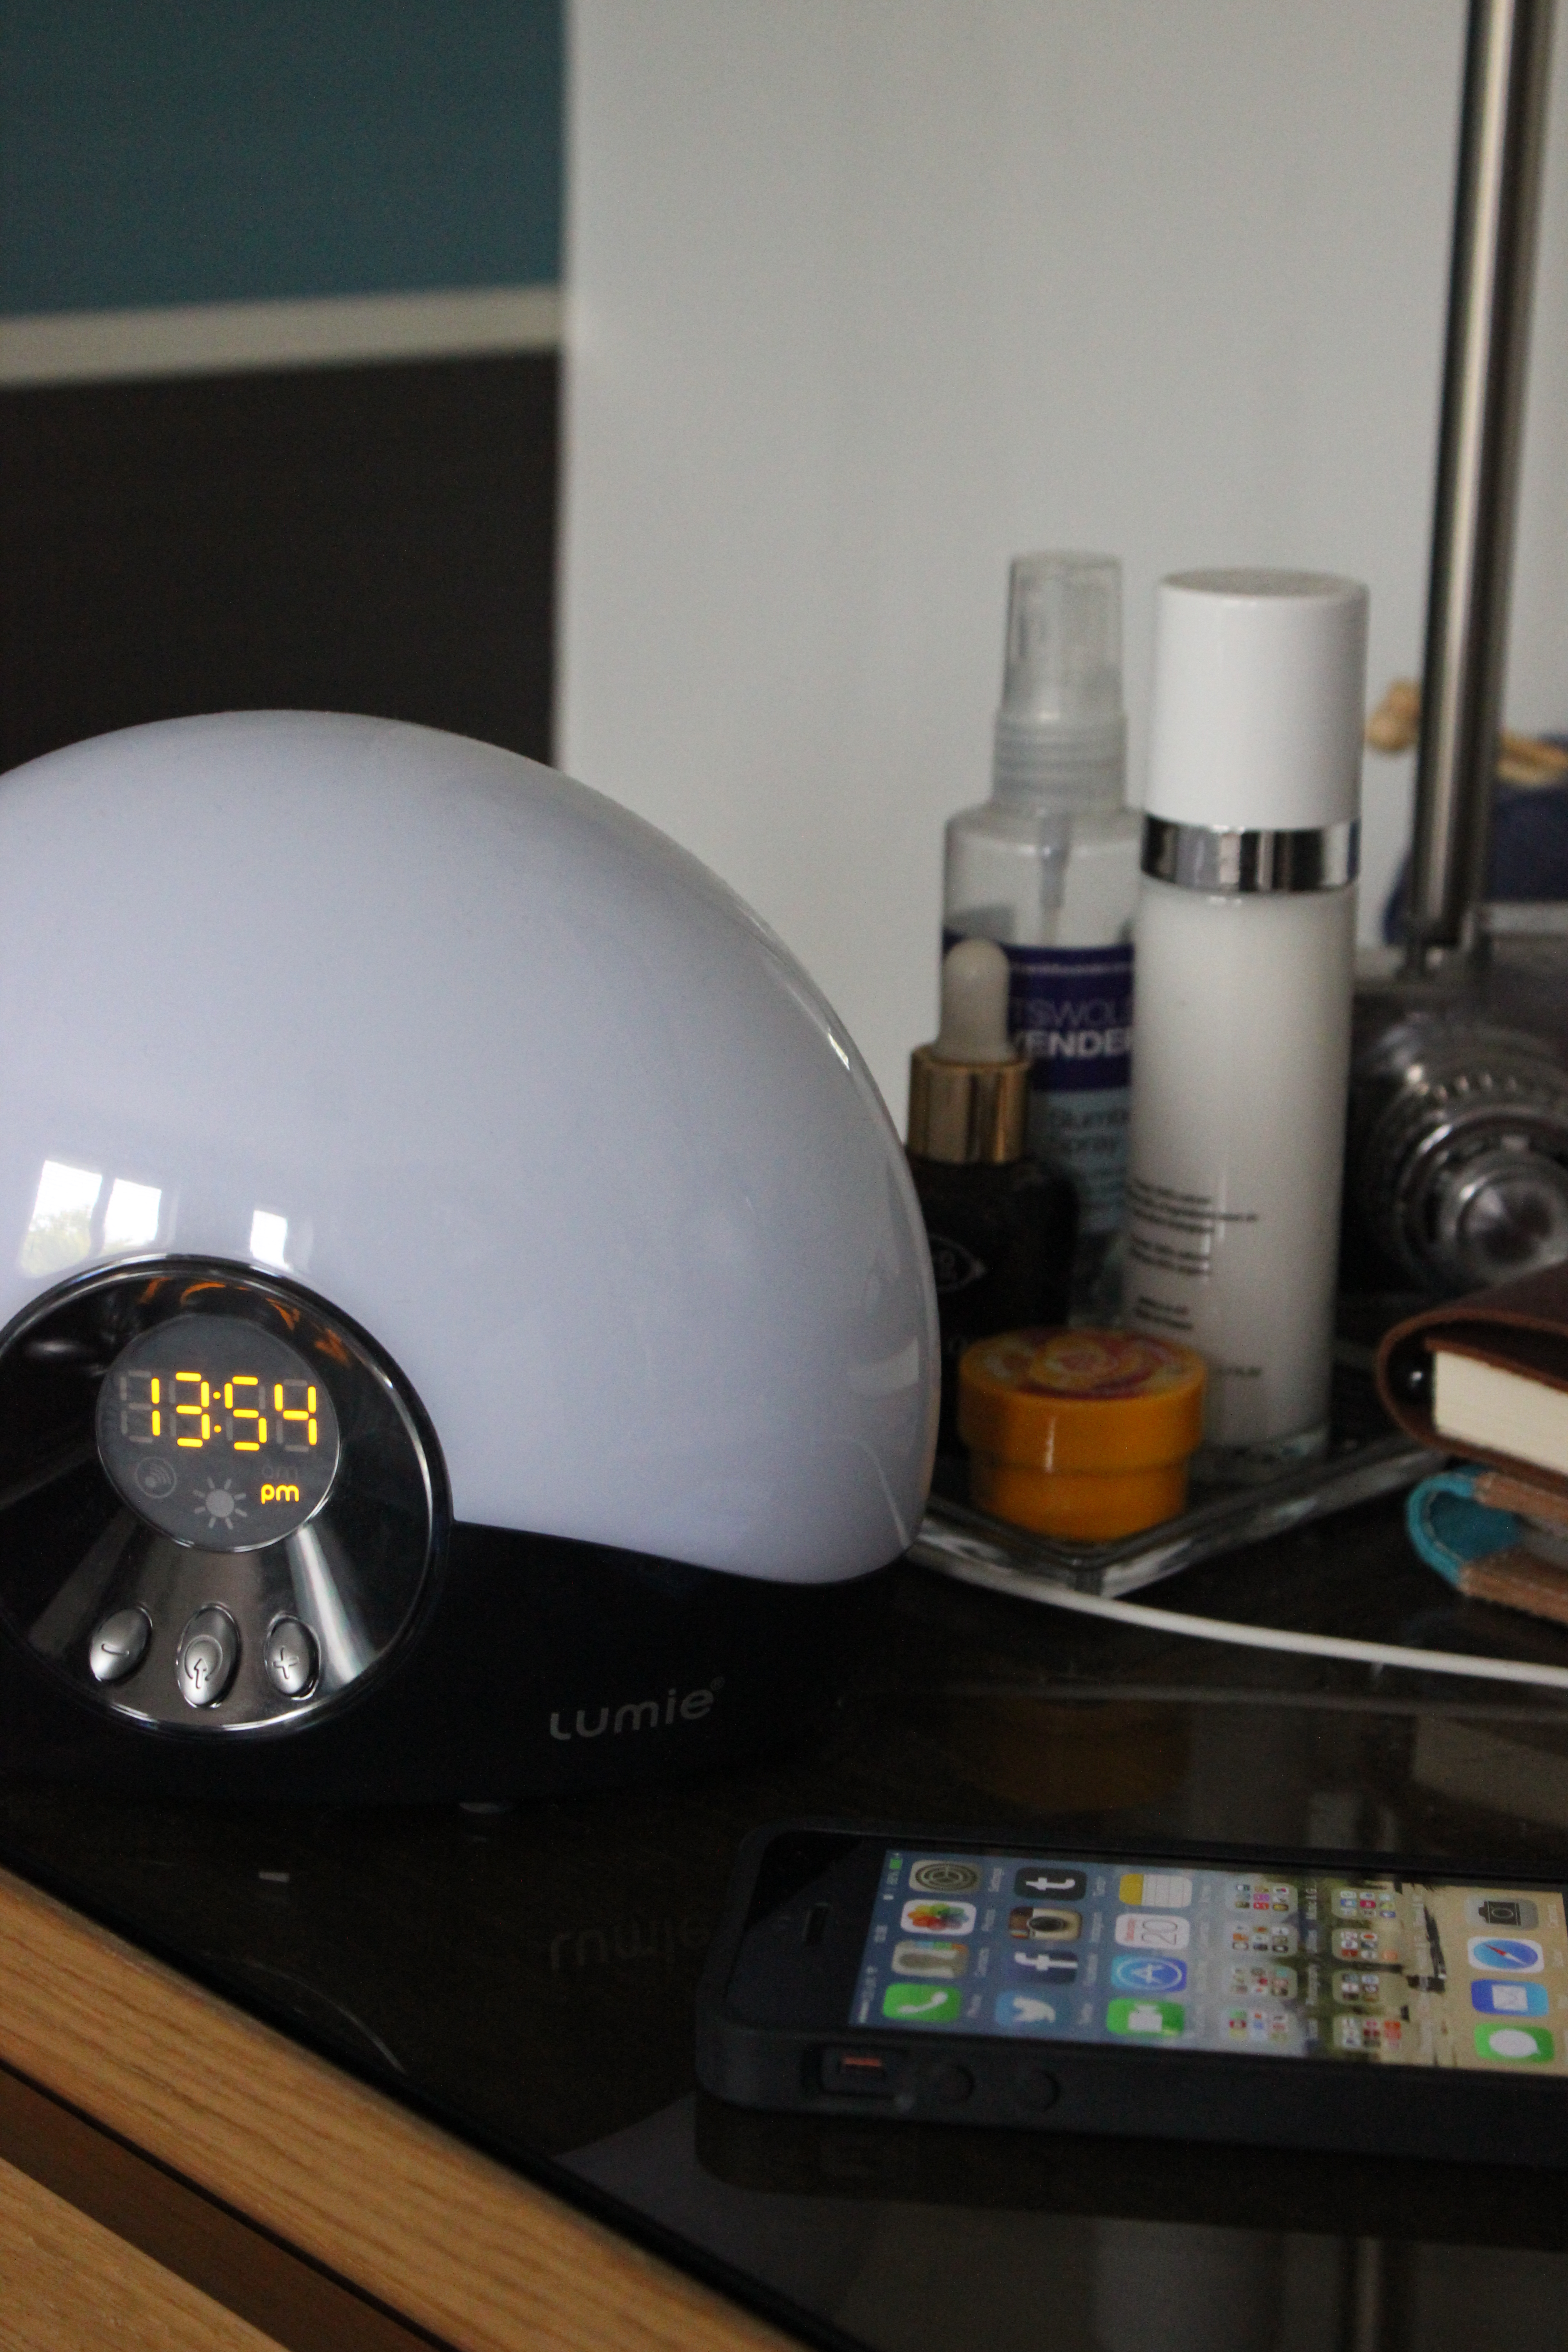 Lumie bodyclock go SAD lamp review | xameliax